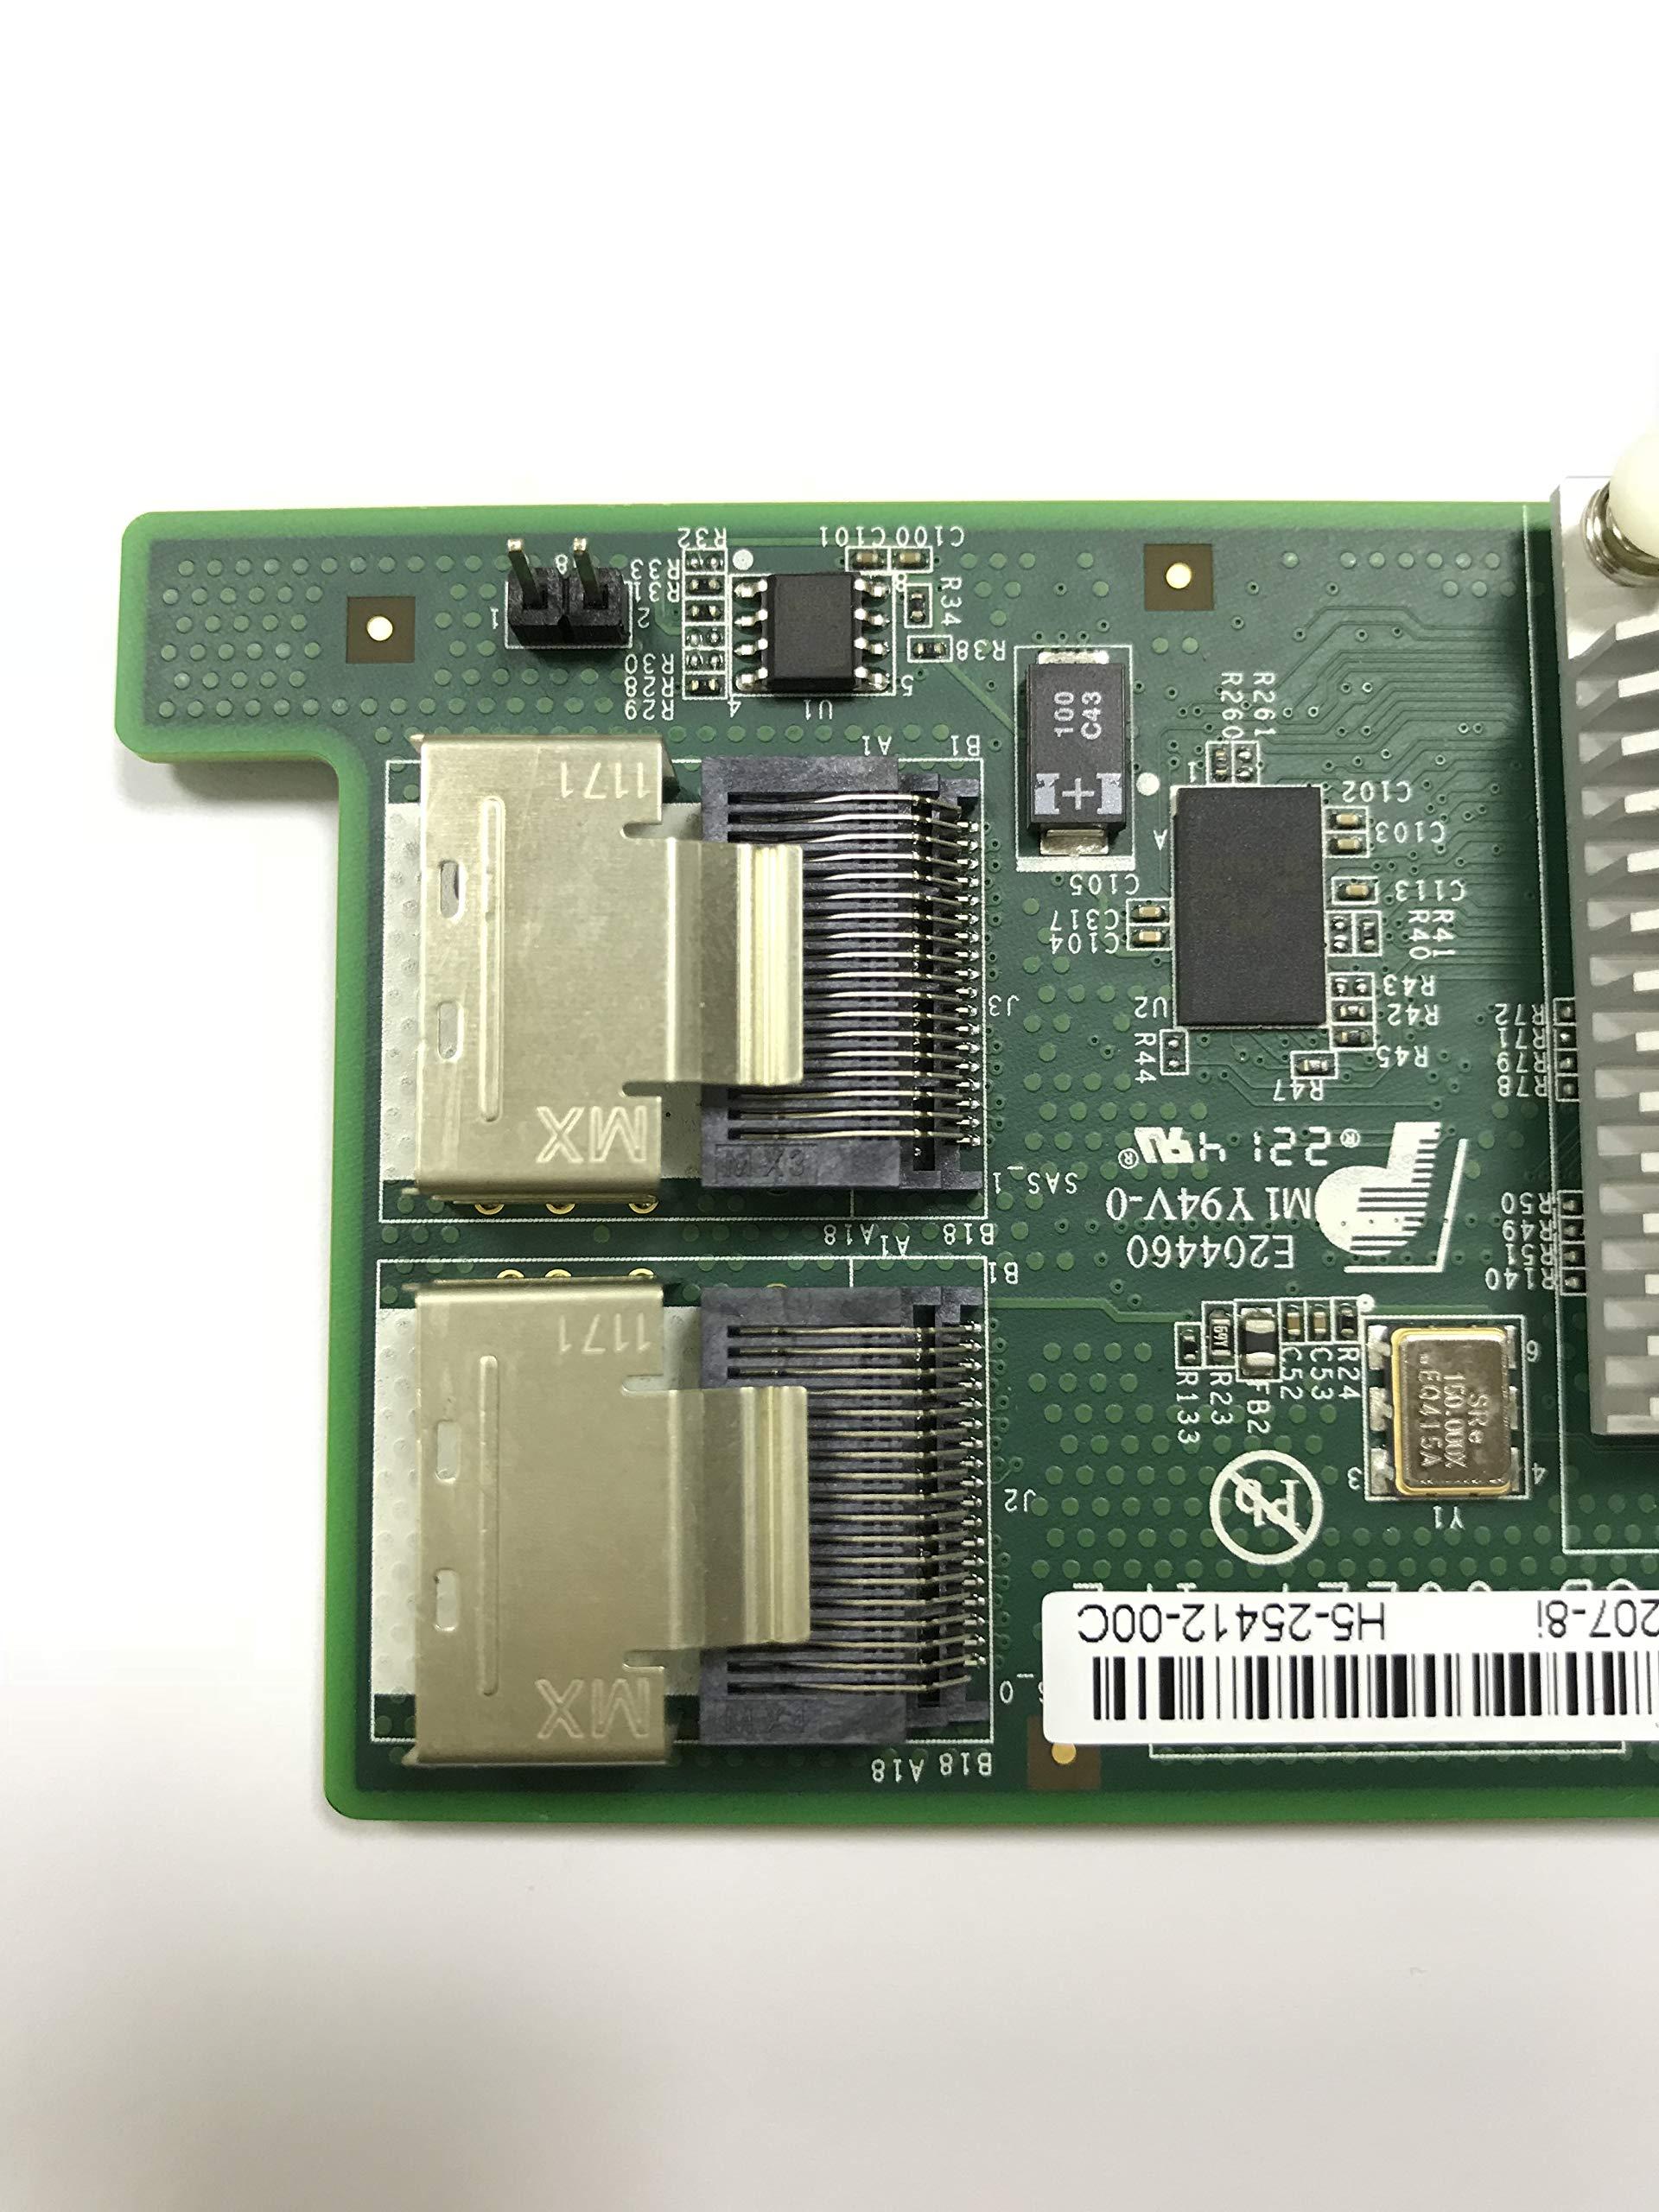 MFU SAS 9207-8i 8-Port 6Gb/s SAS+SATA to PCI Express 2.0 Host Bus Adapter by MFU (Image #6)